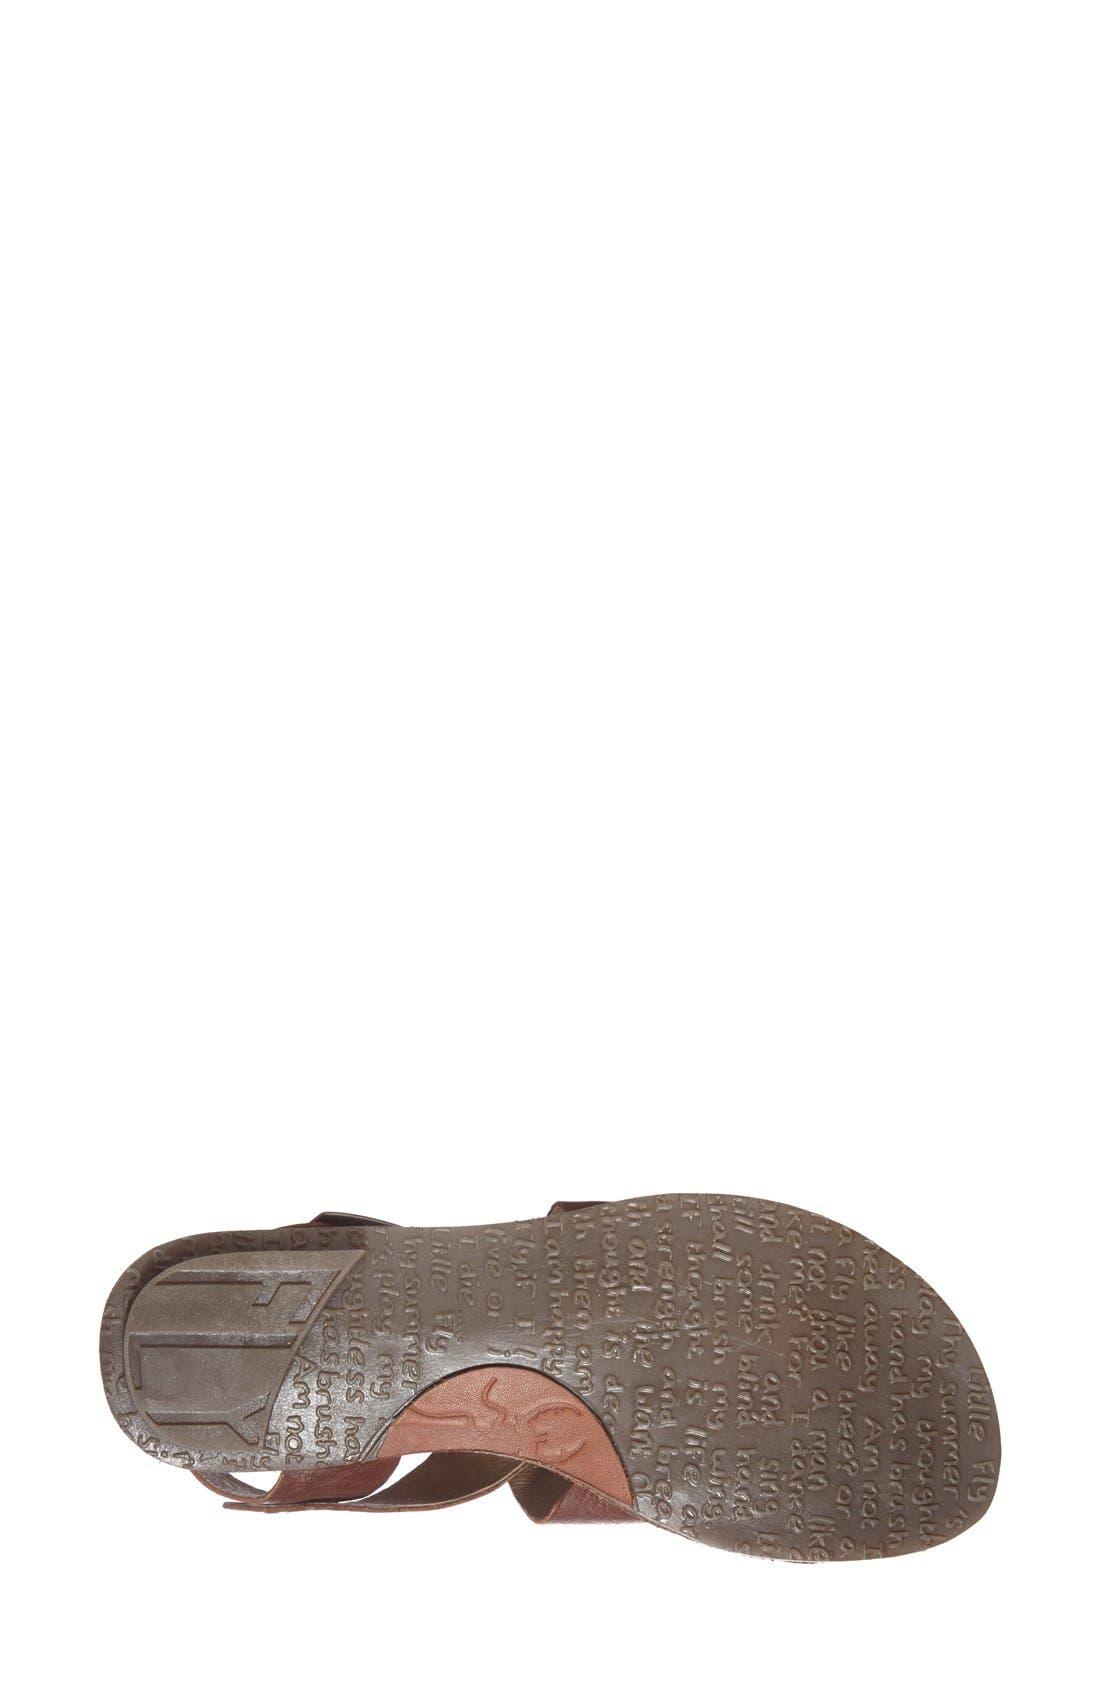 Alternate Image 4  - Fly London 'Bian' Flat Leather Sandal (Women)